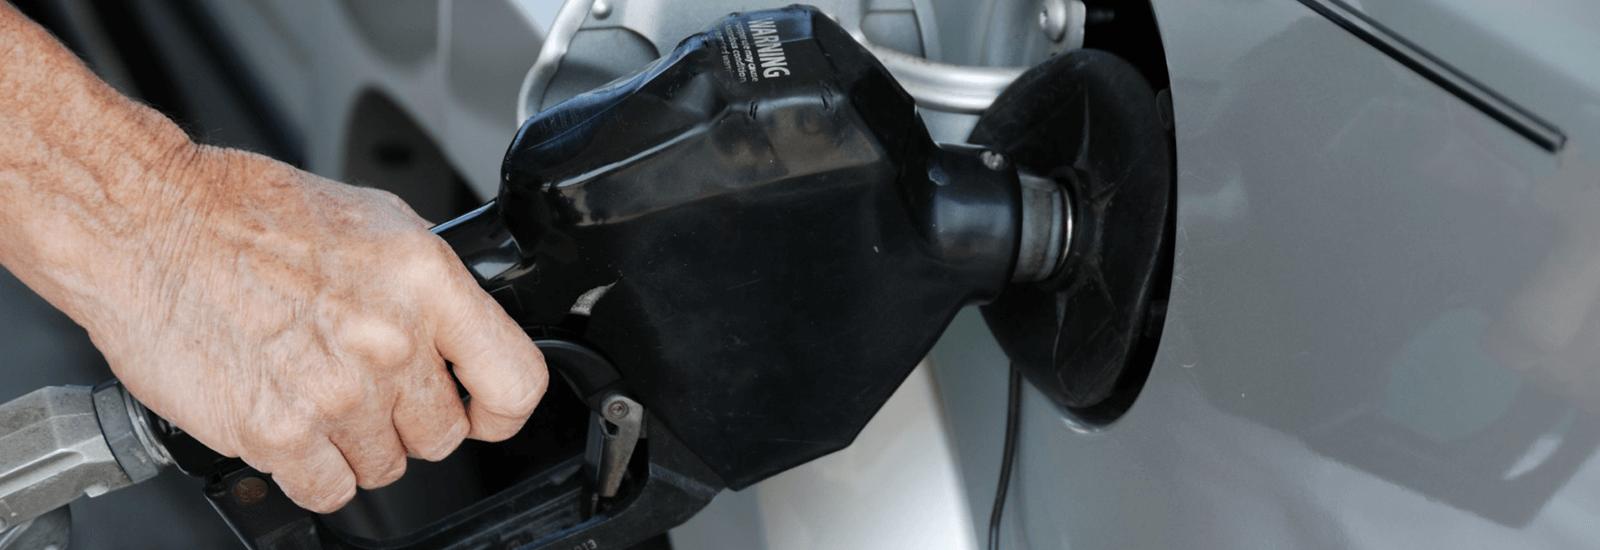 pumping-gasoline